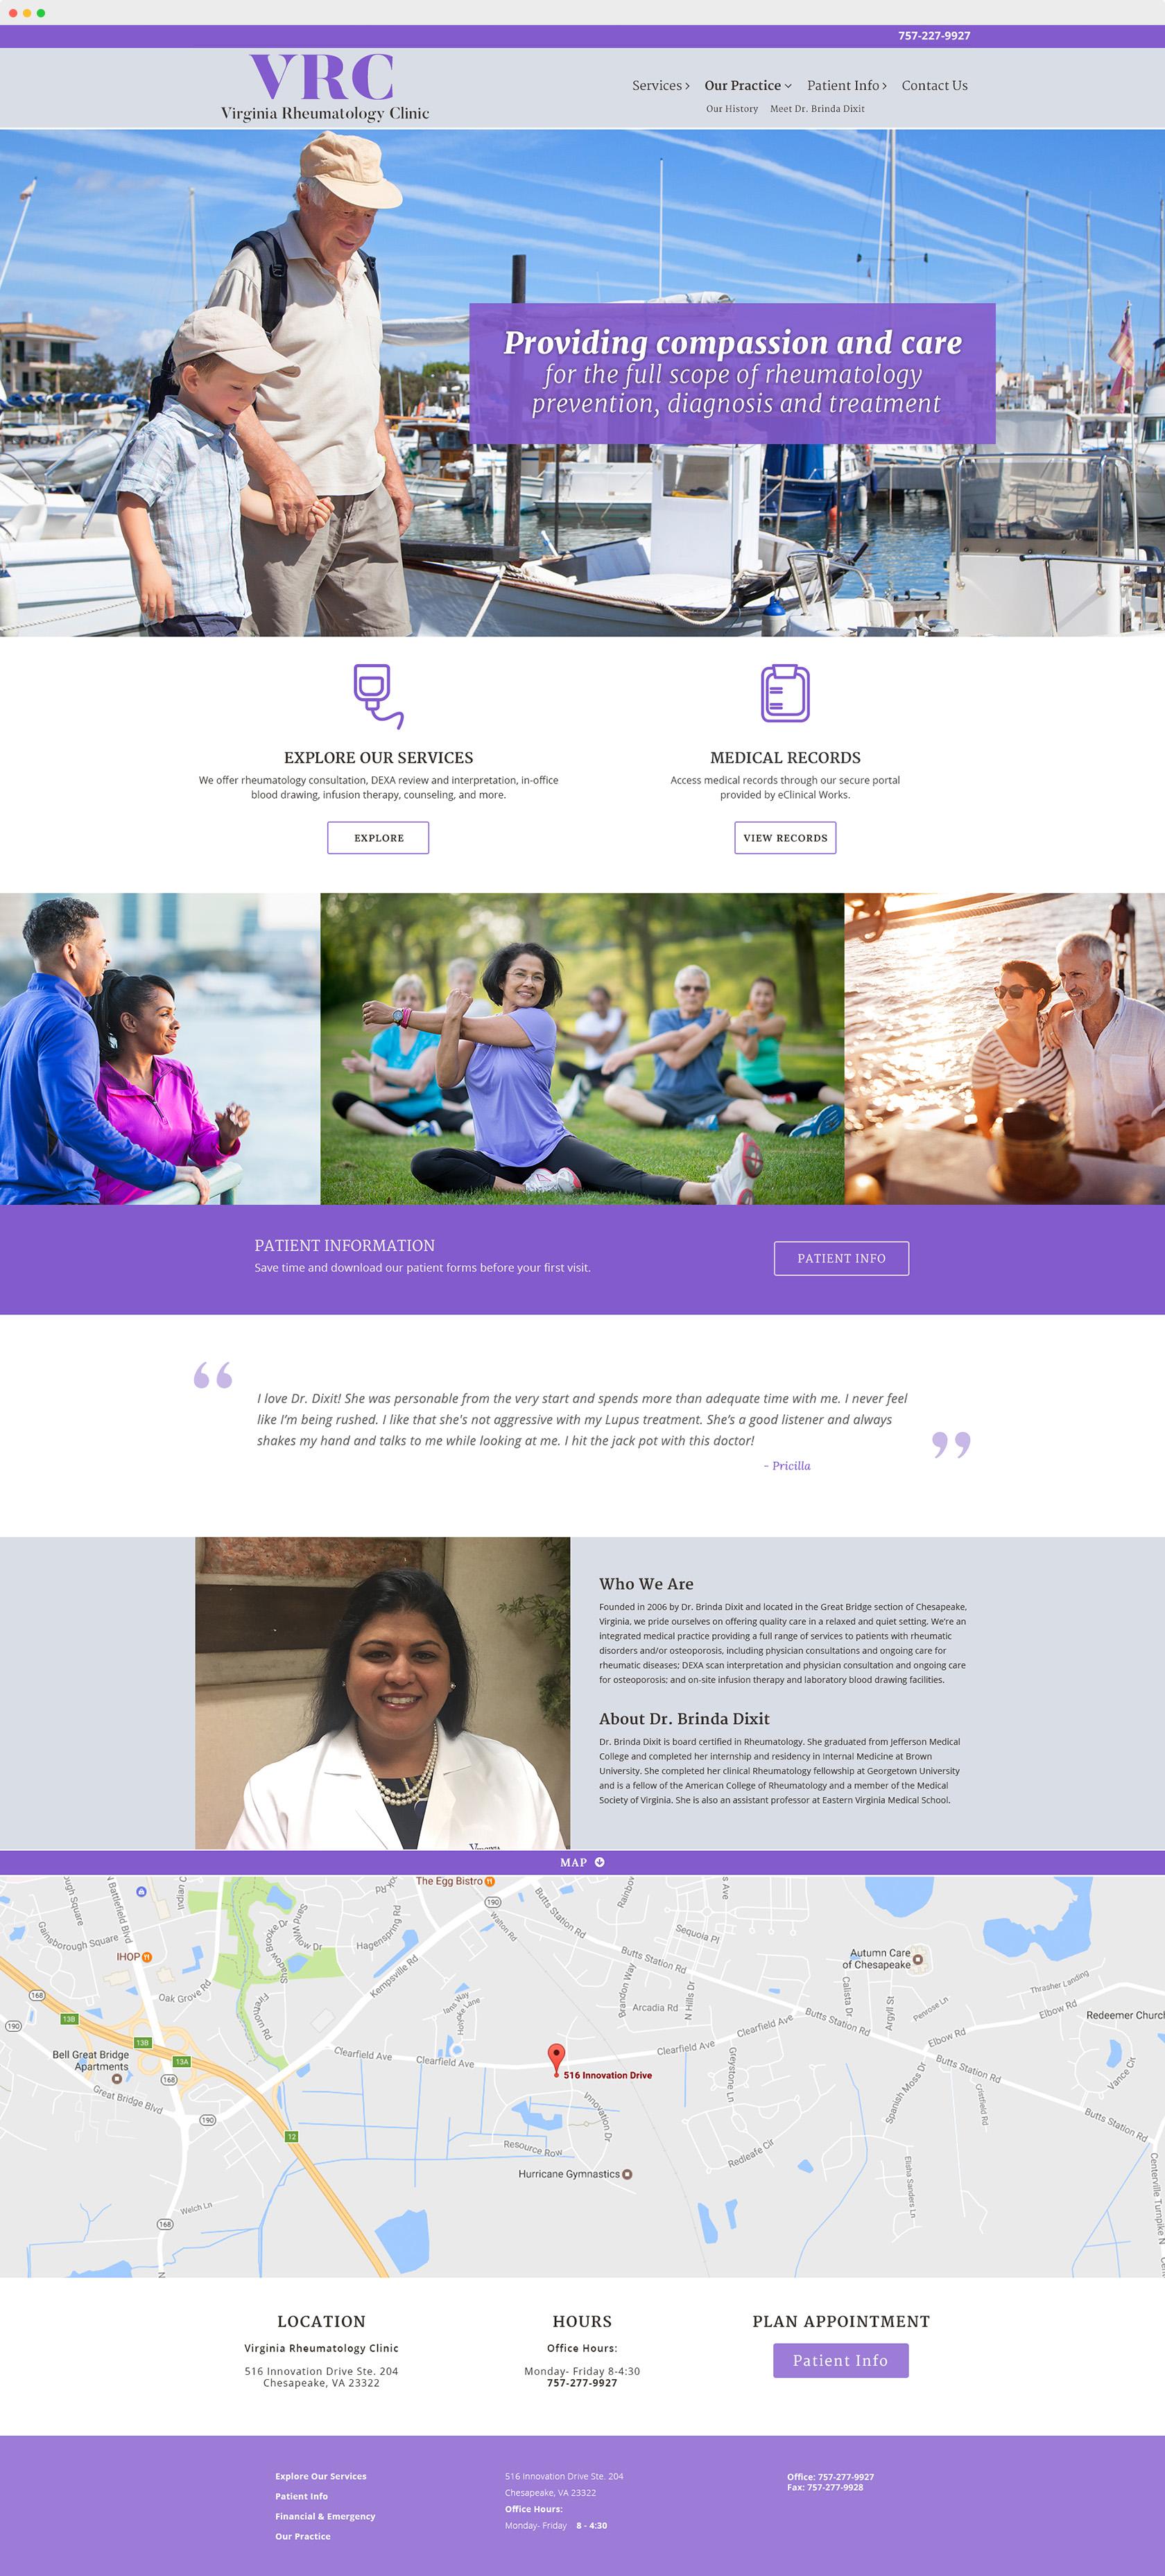 virginia rheumatology clinic website